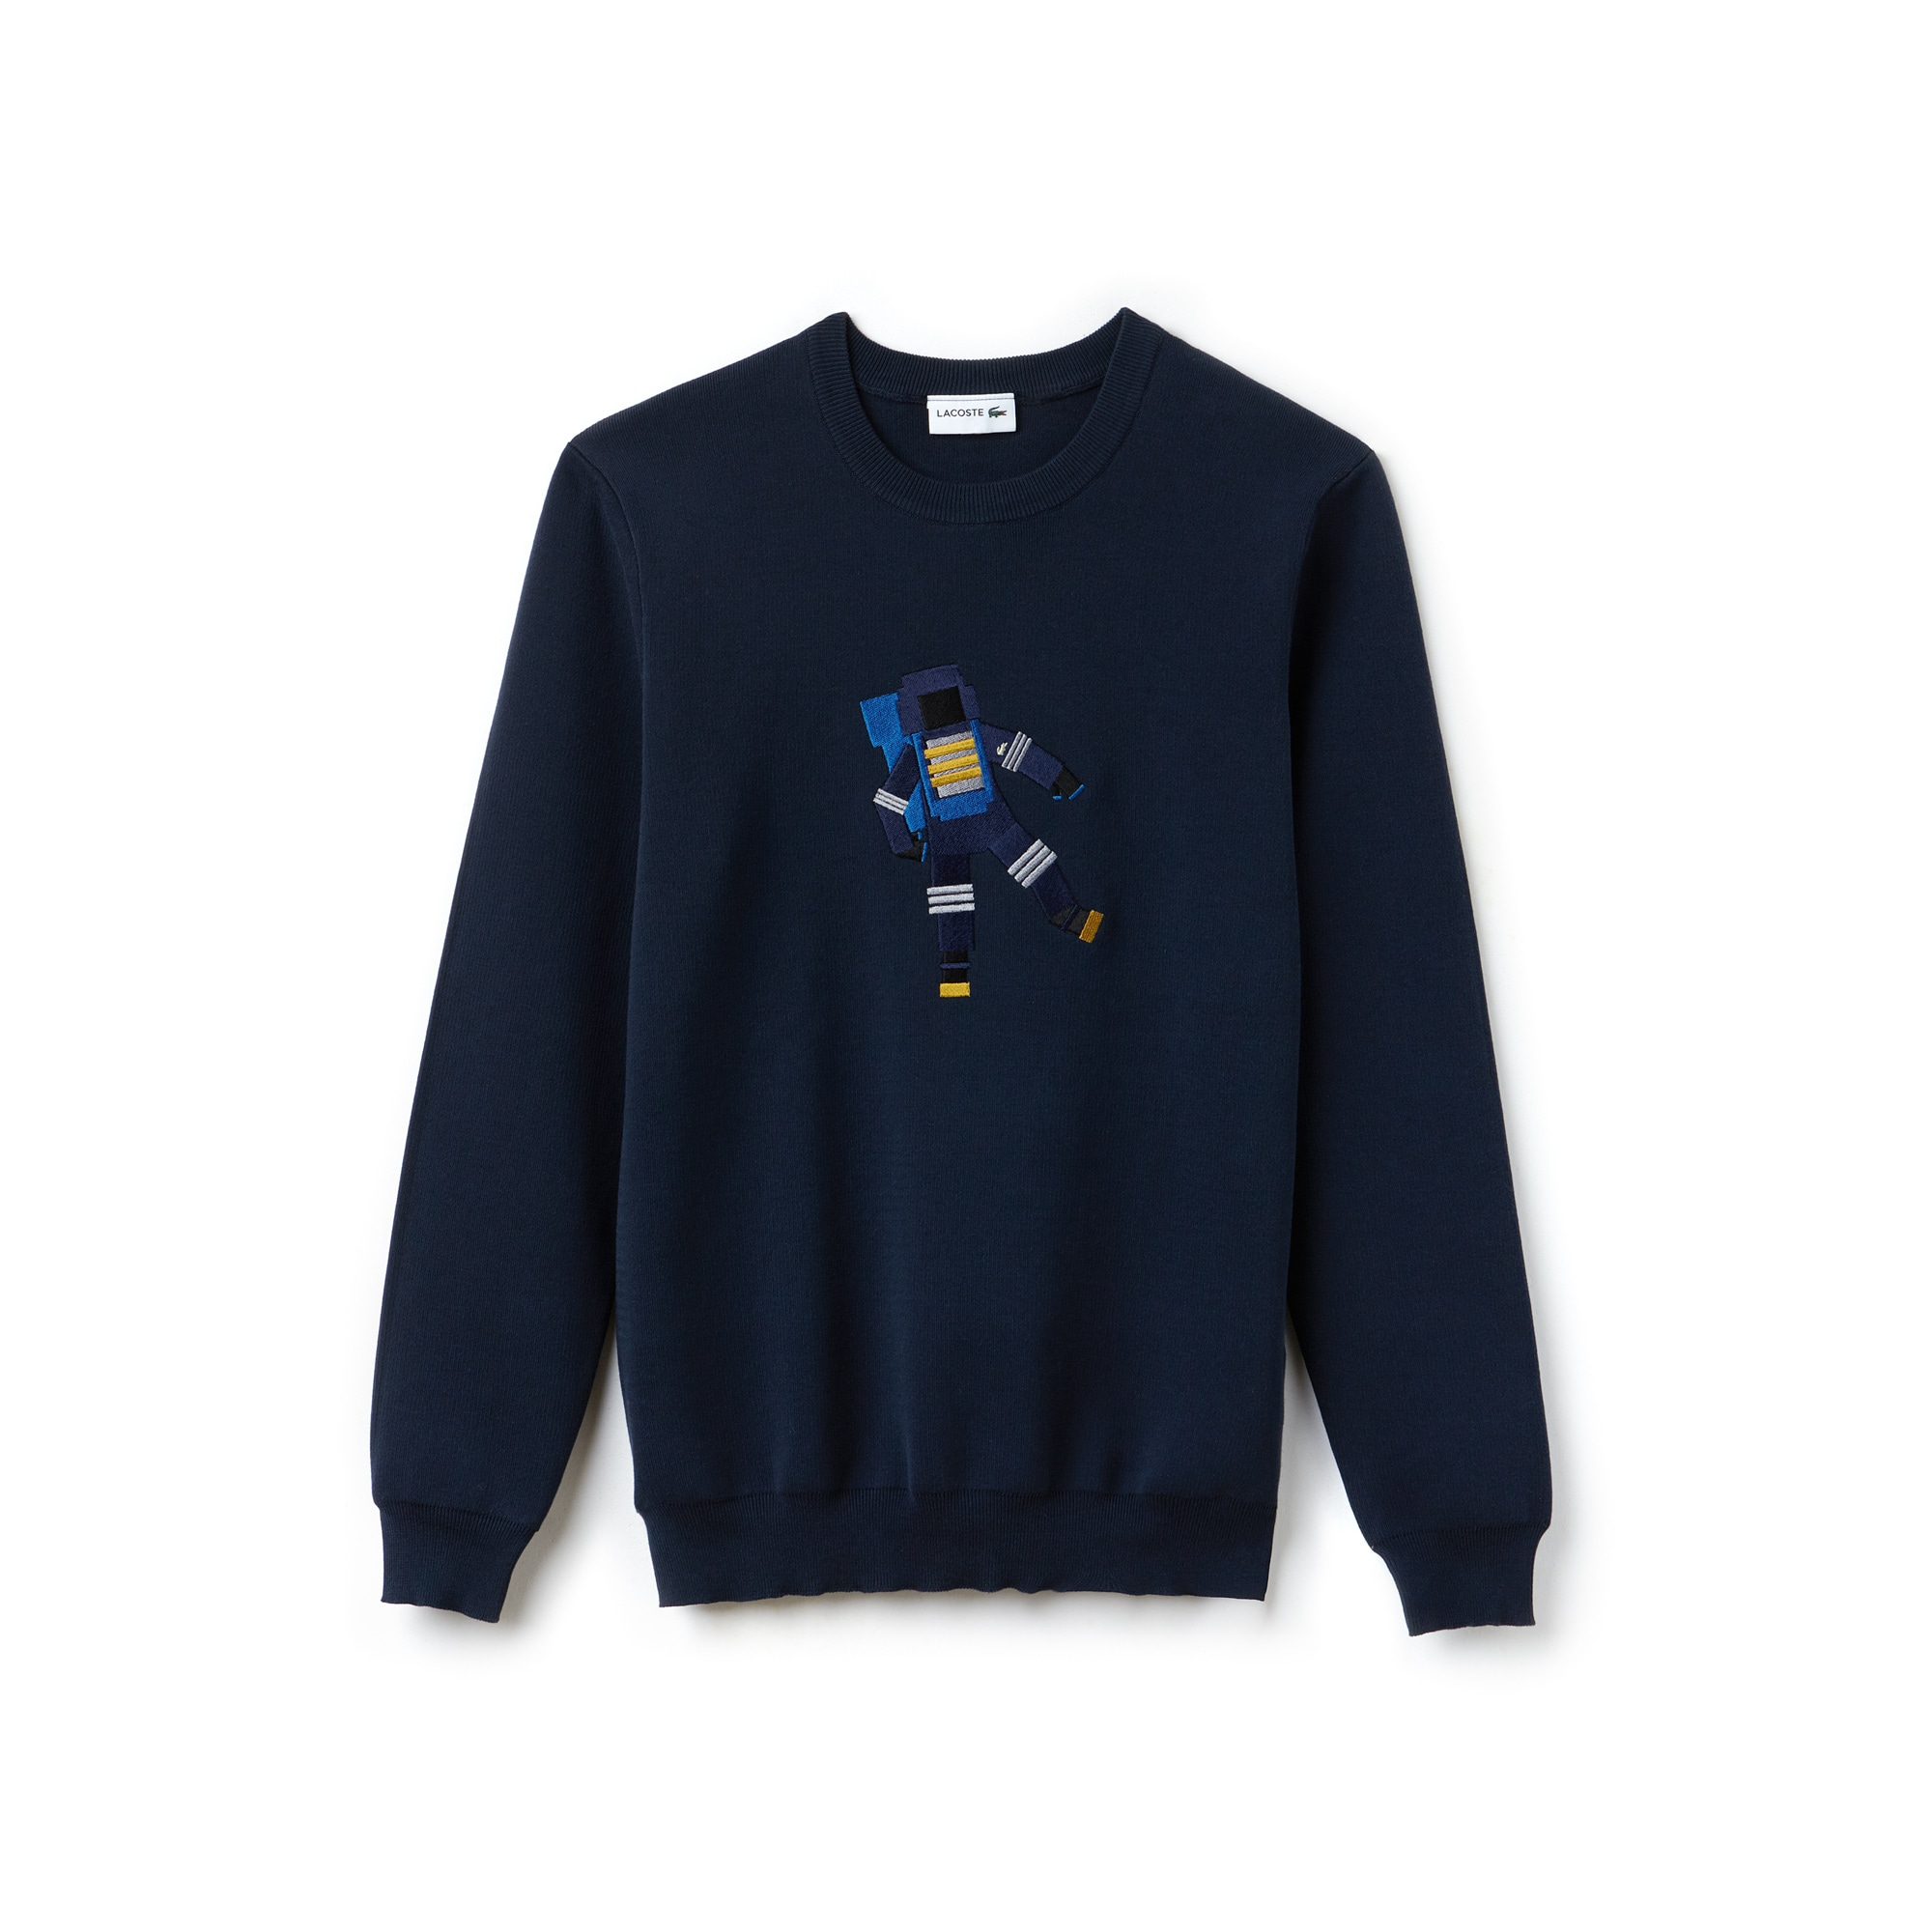 Men's Crew Neck Astronaut Embroidery Cotton Interlock Sweater